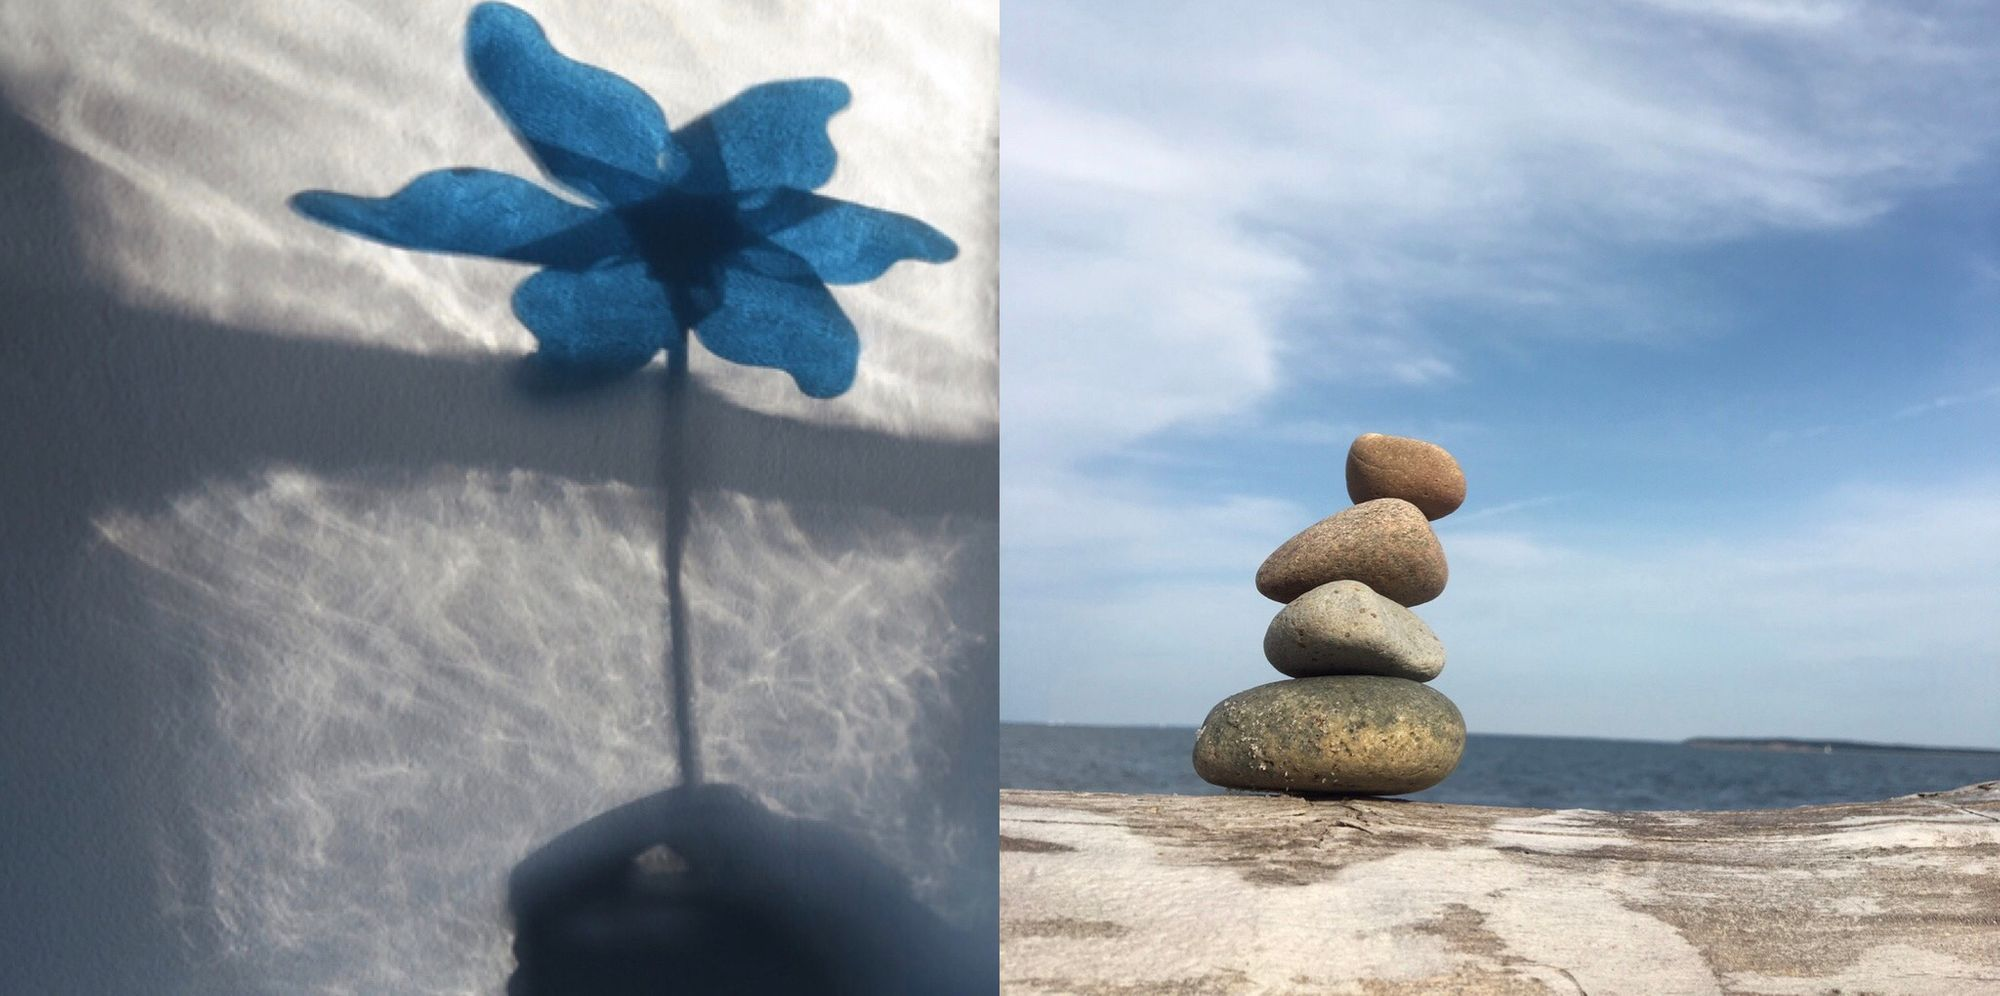 pinwheel & beach stones.jpg